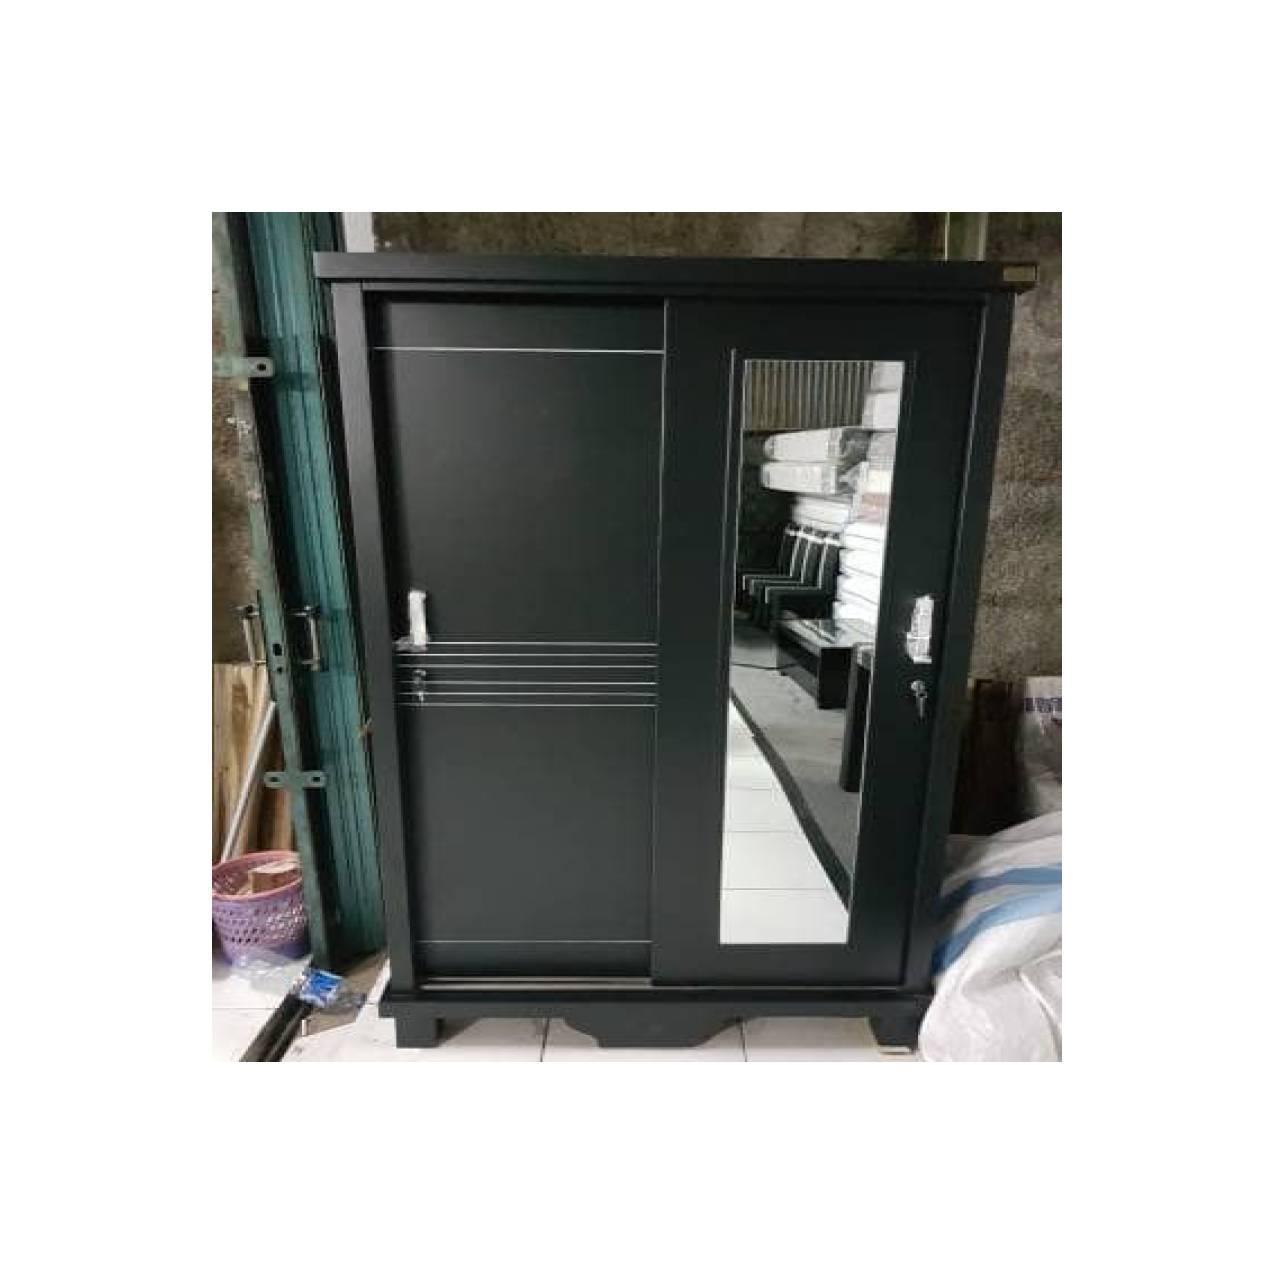 Lemari Blockteak 2 pintu minimalis